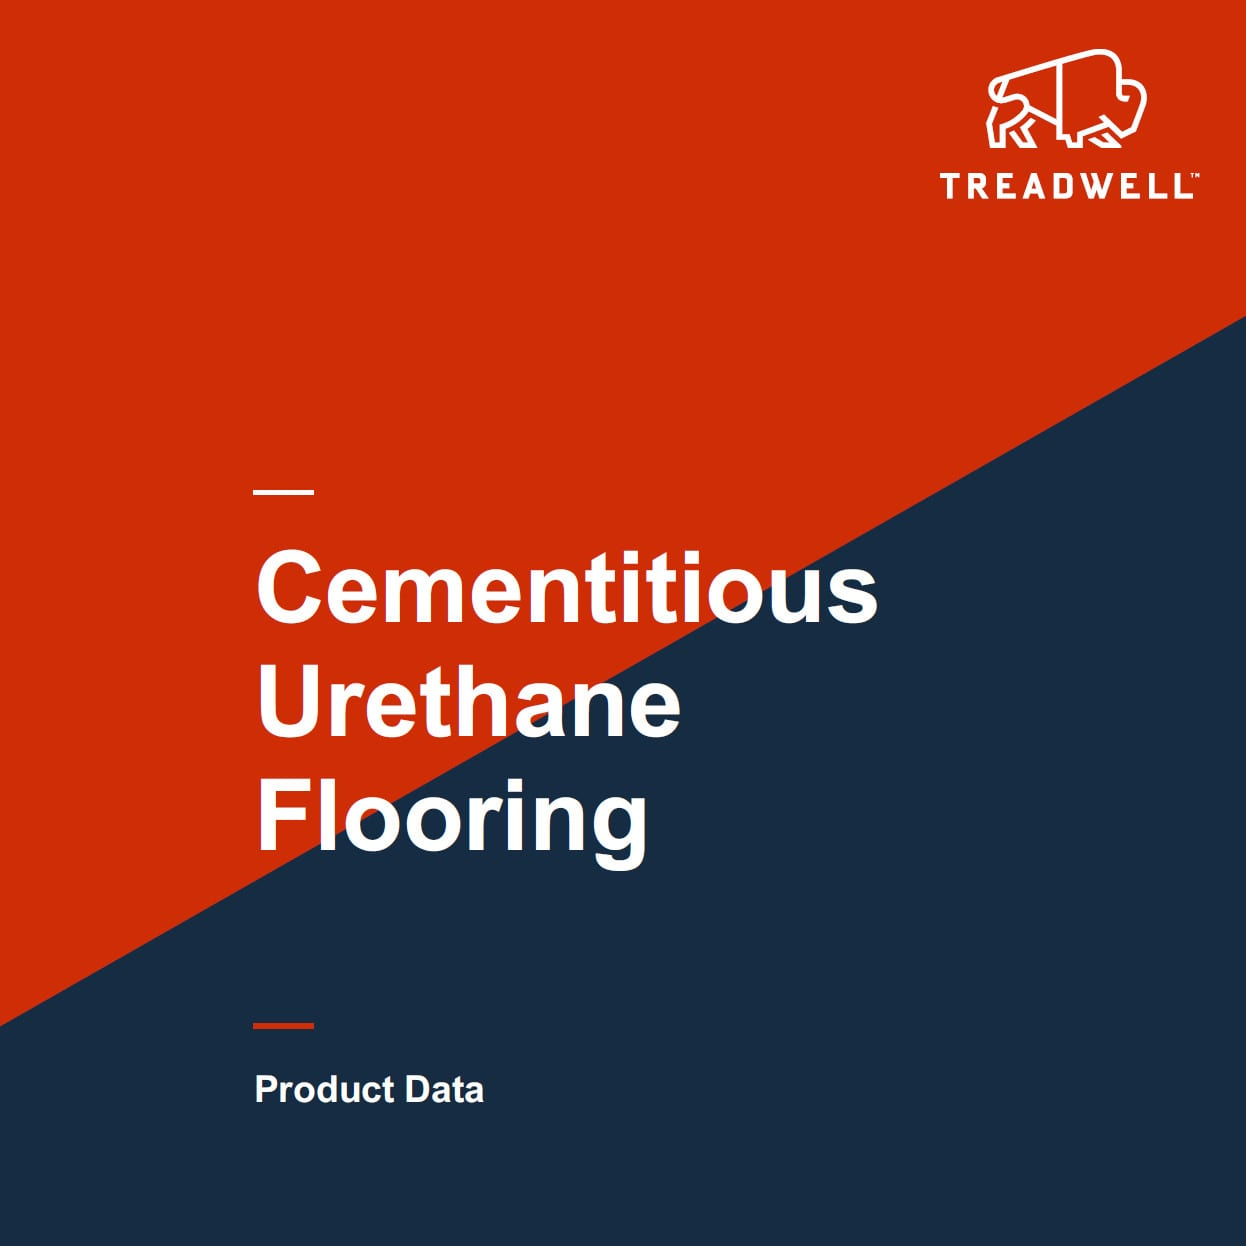 Product Data Sheets Treadwell